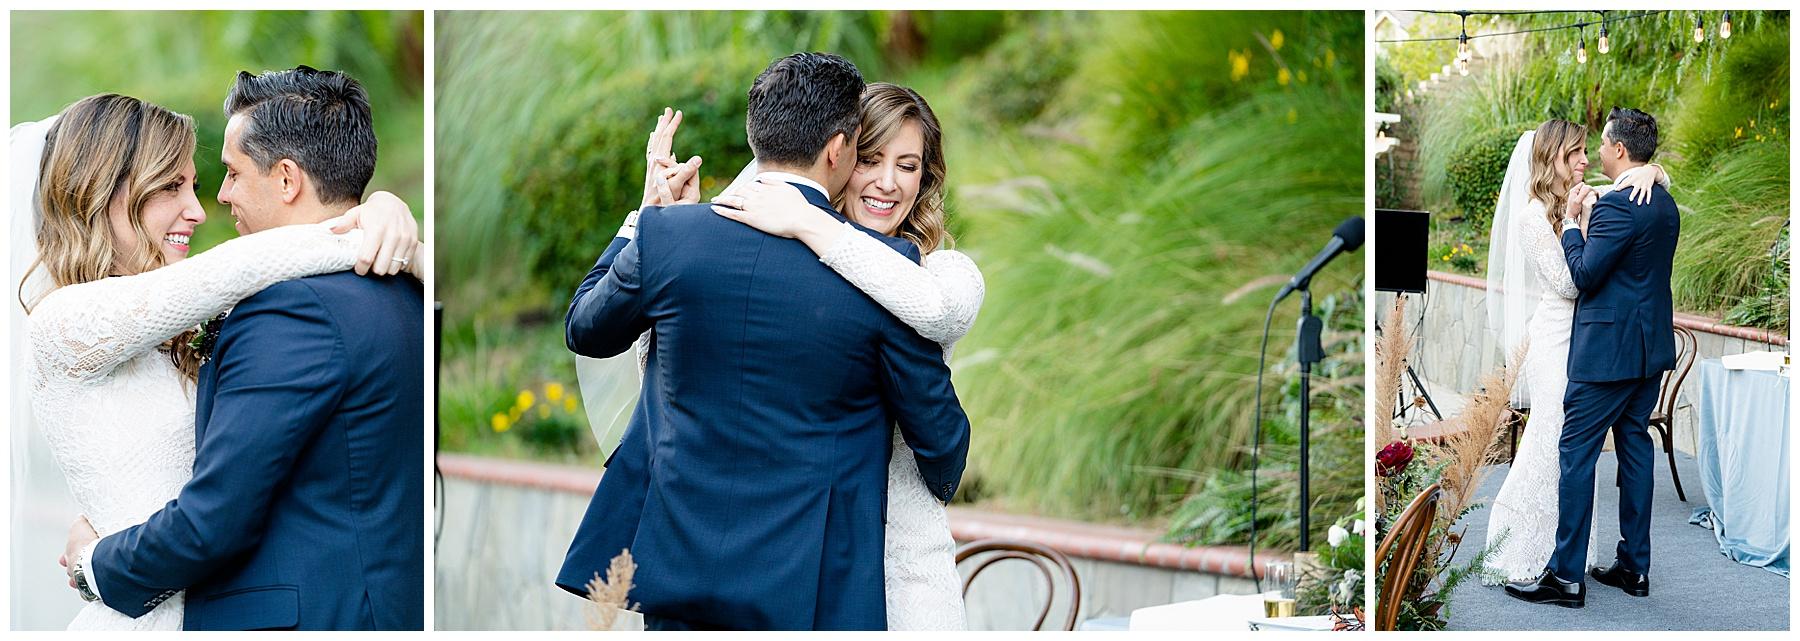 first dance backyard wedding